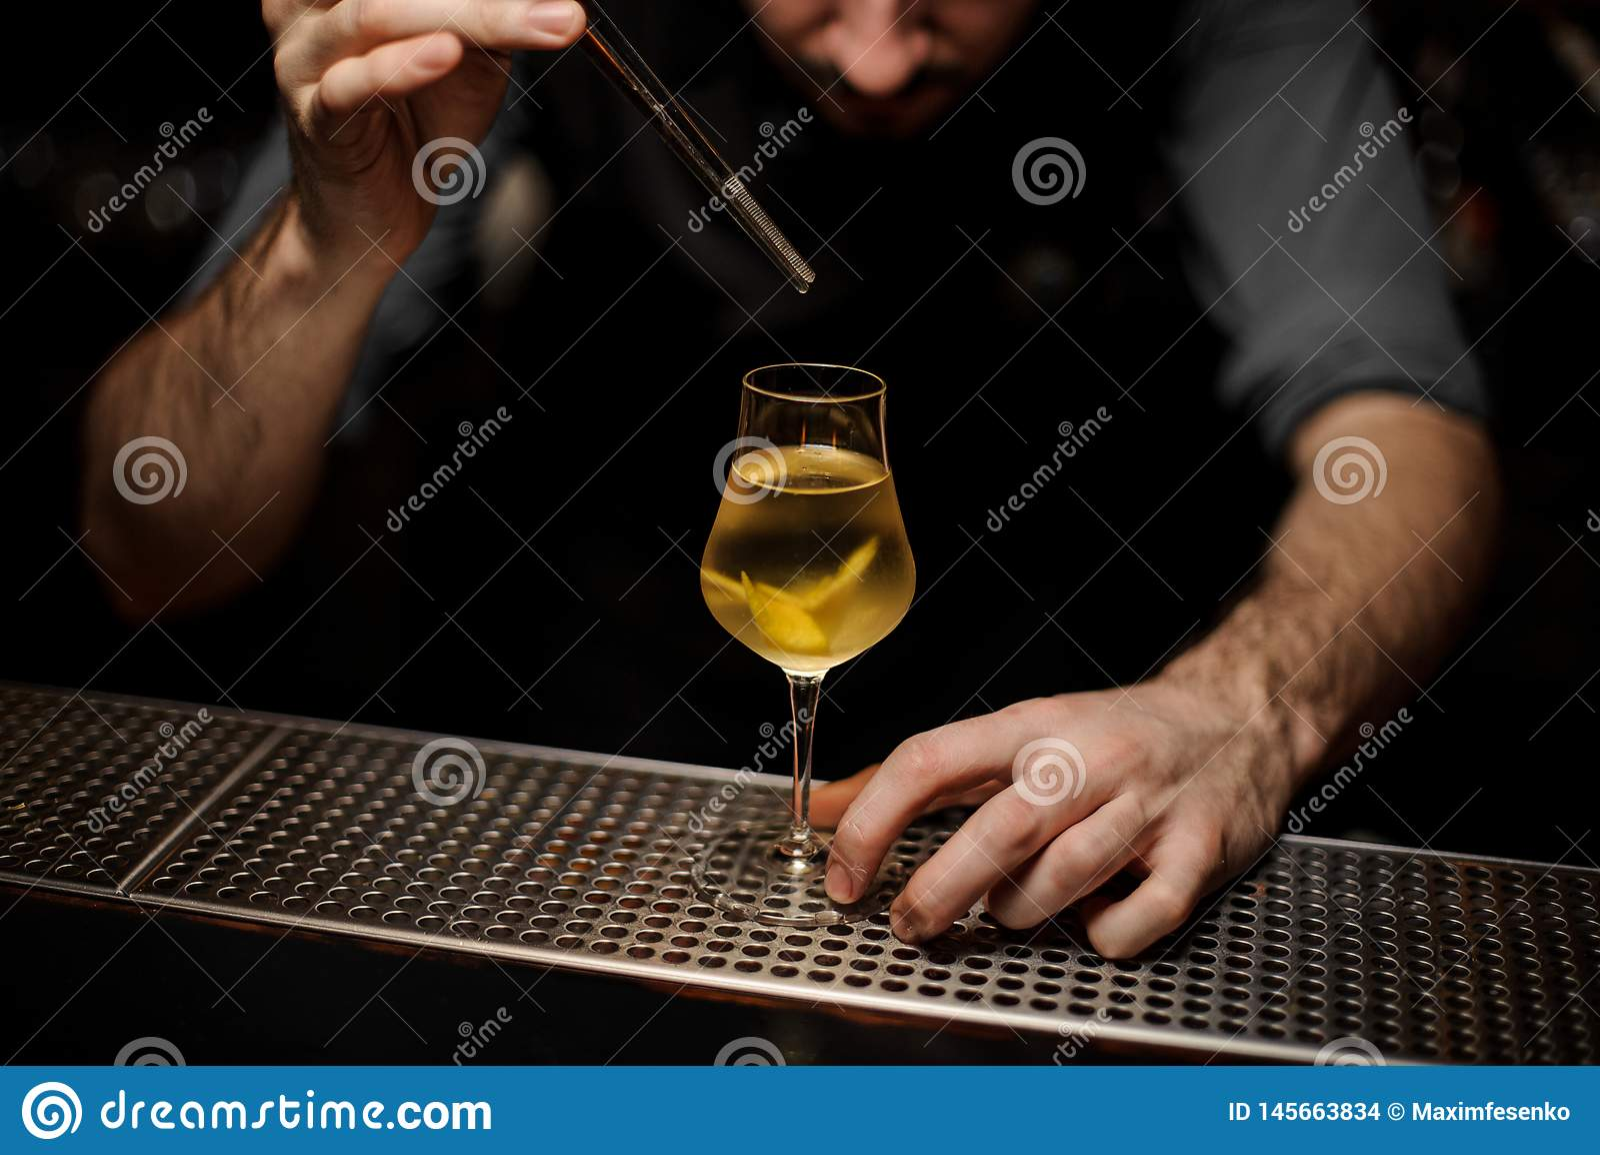 Bartedner adding lemon rind with forceps in cocktail